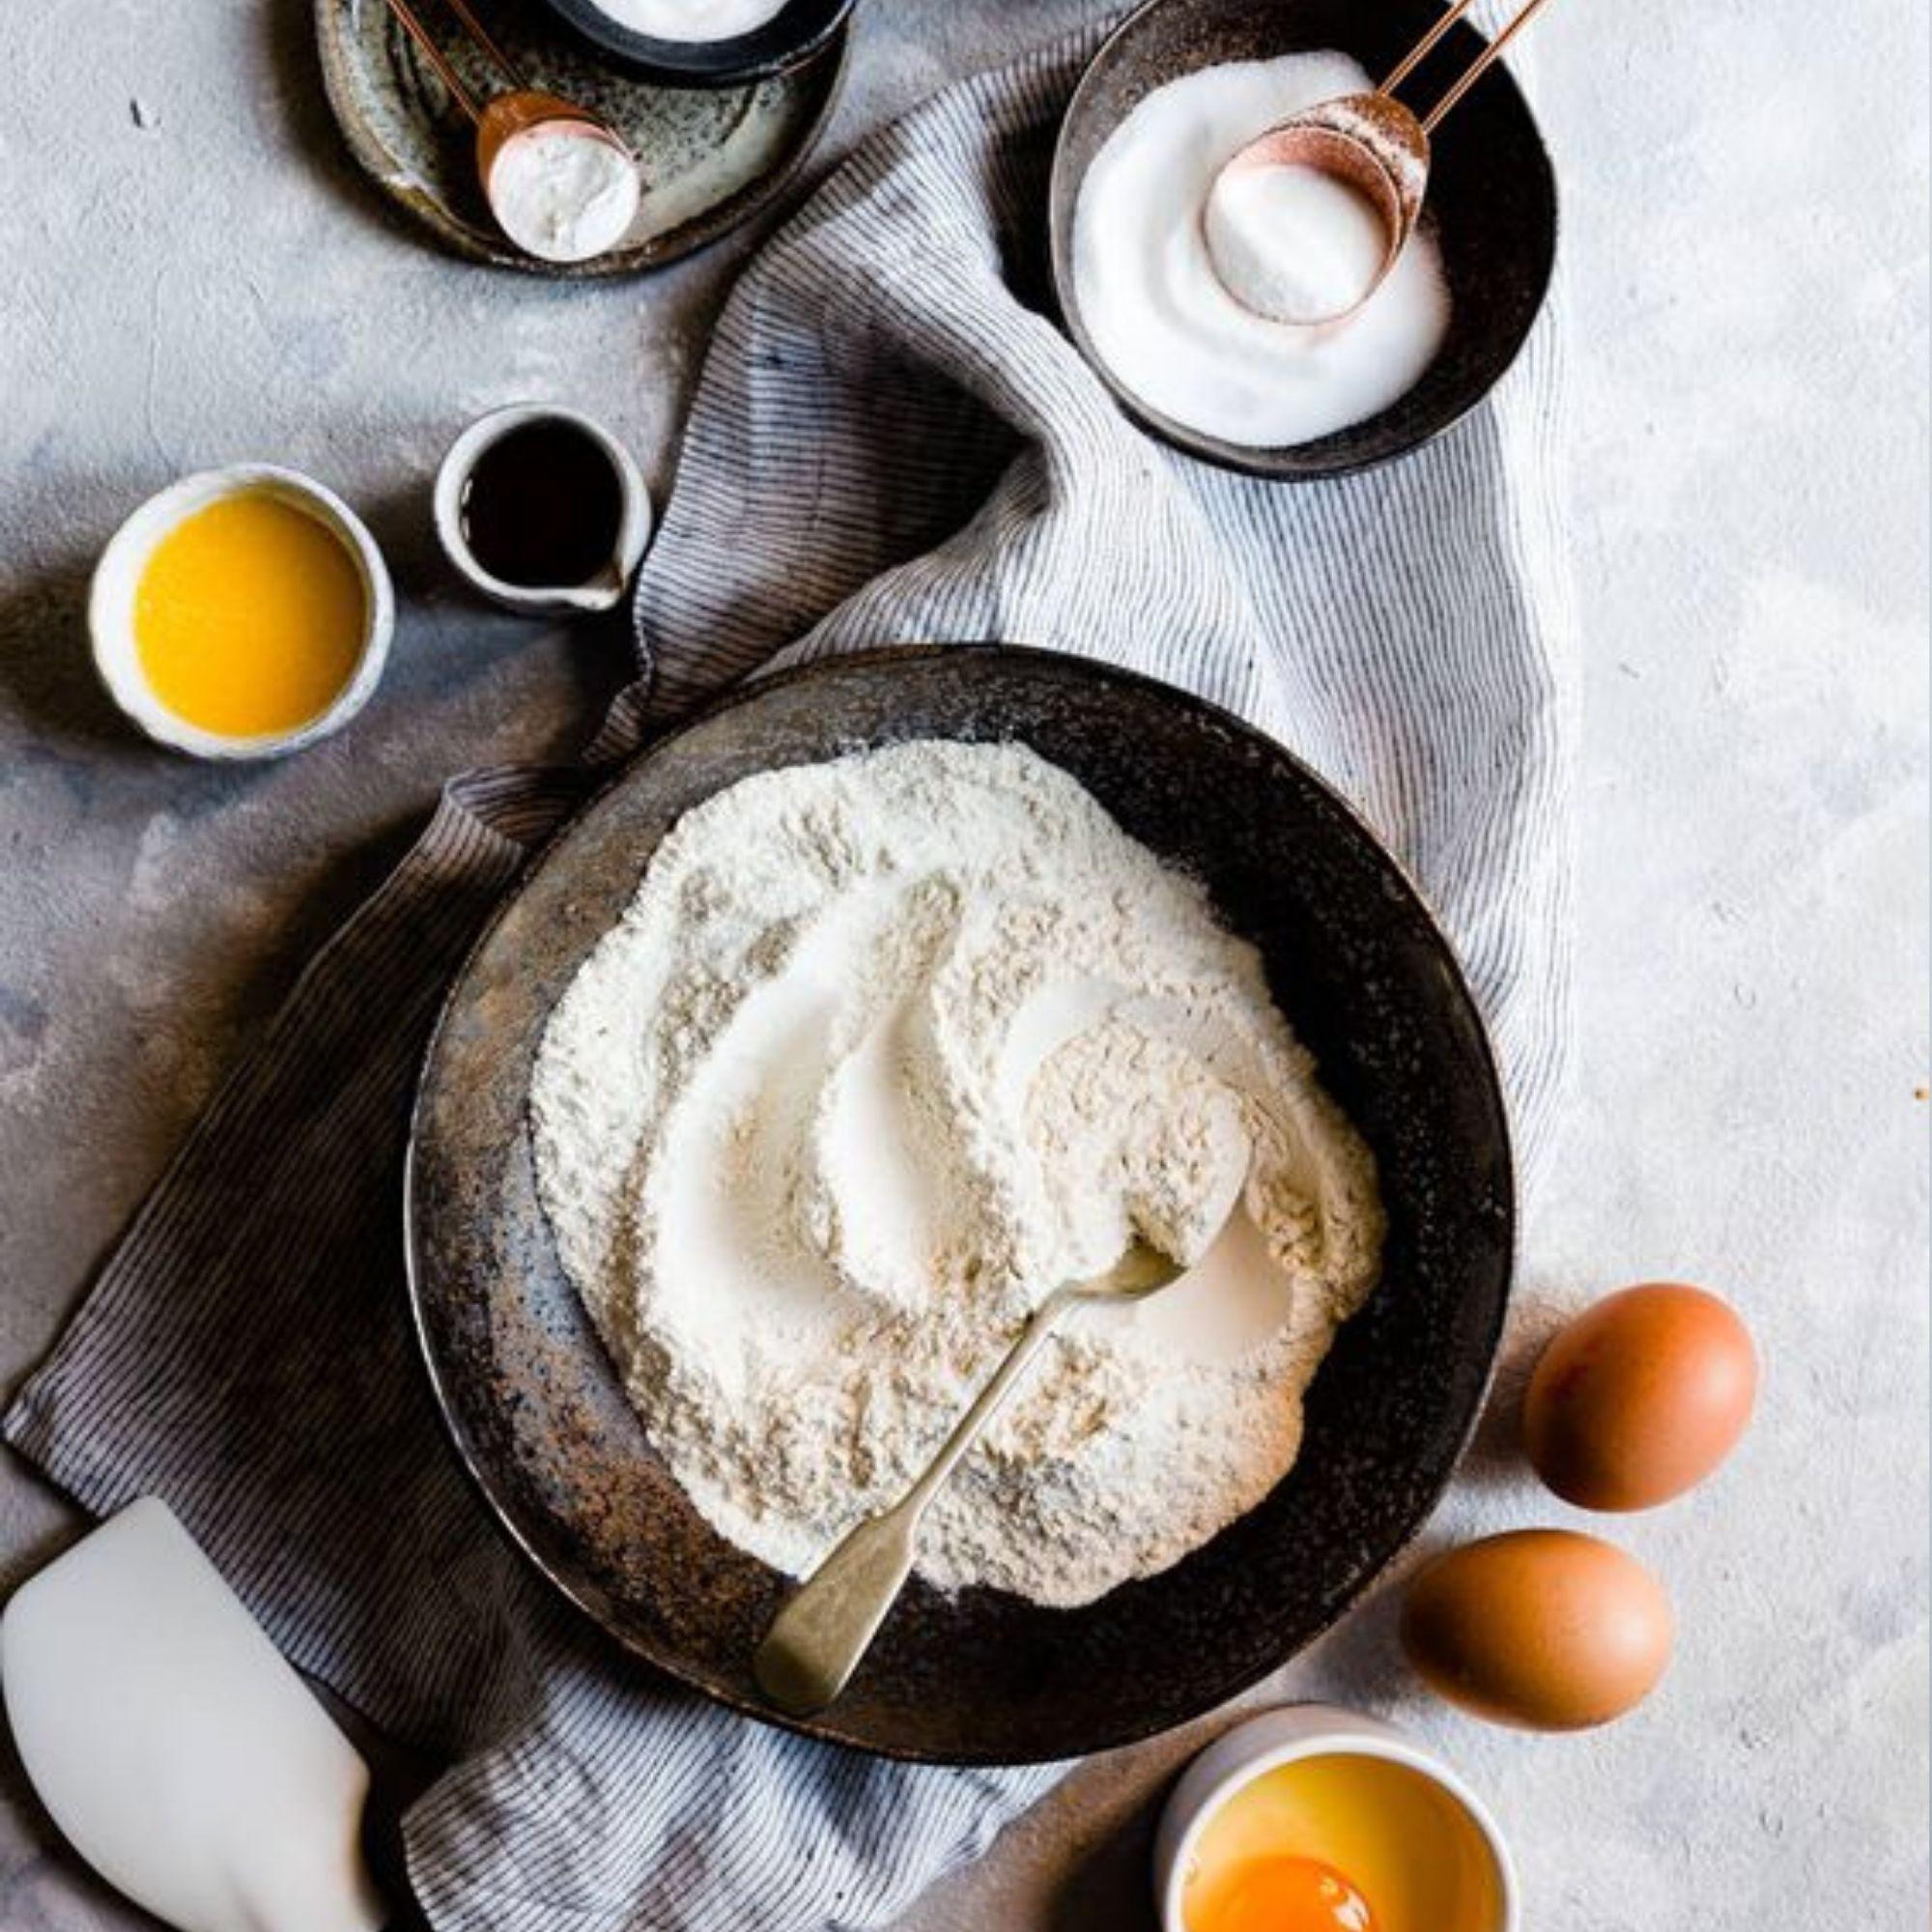 Baking essentials (flour, egg, sugar) flatlay